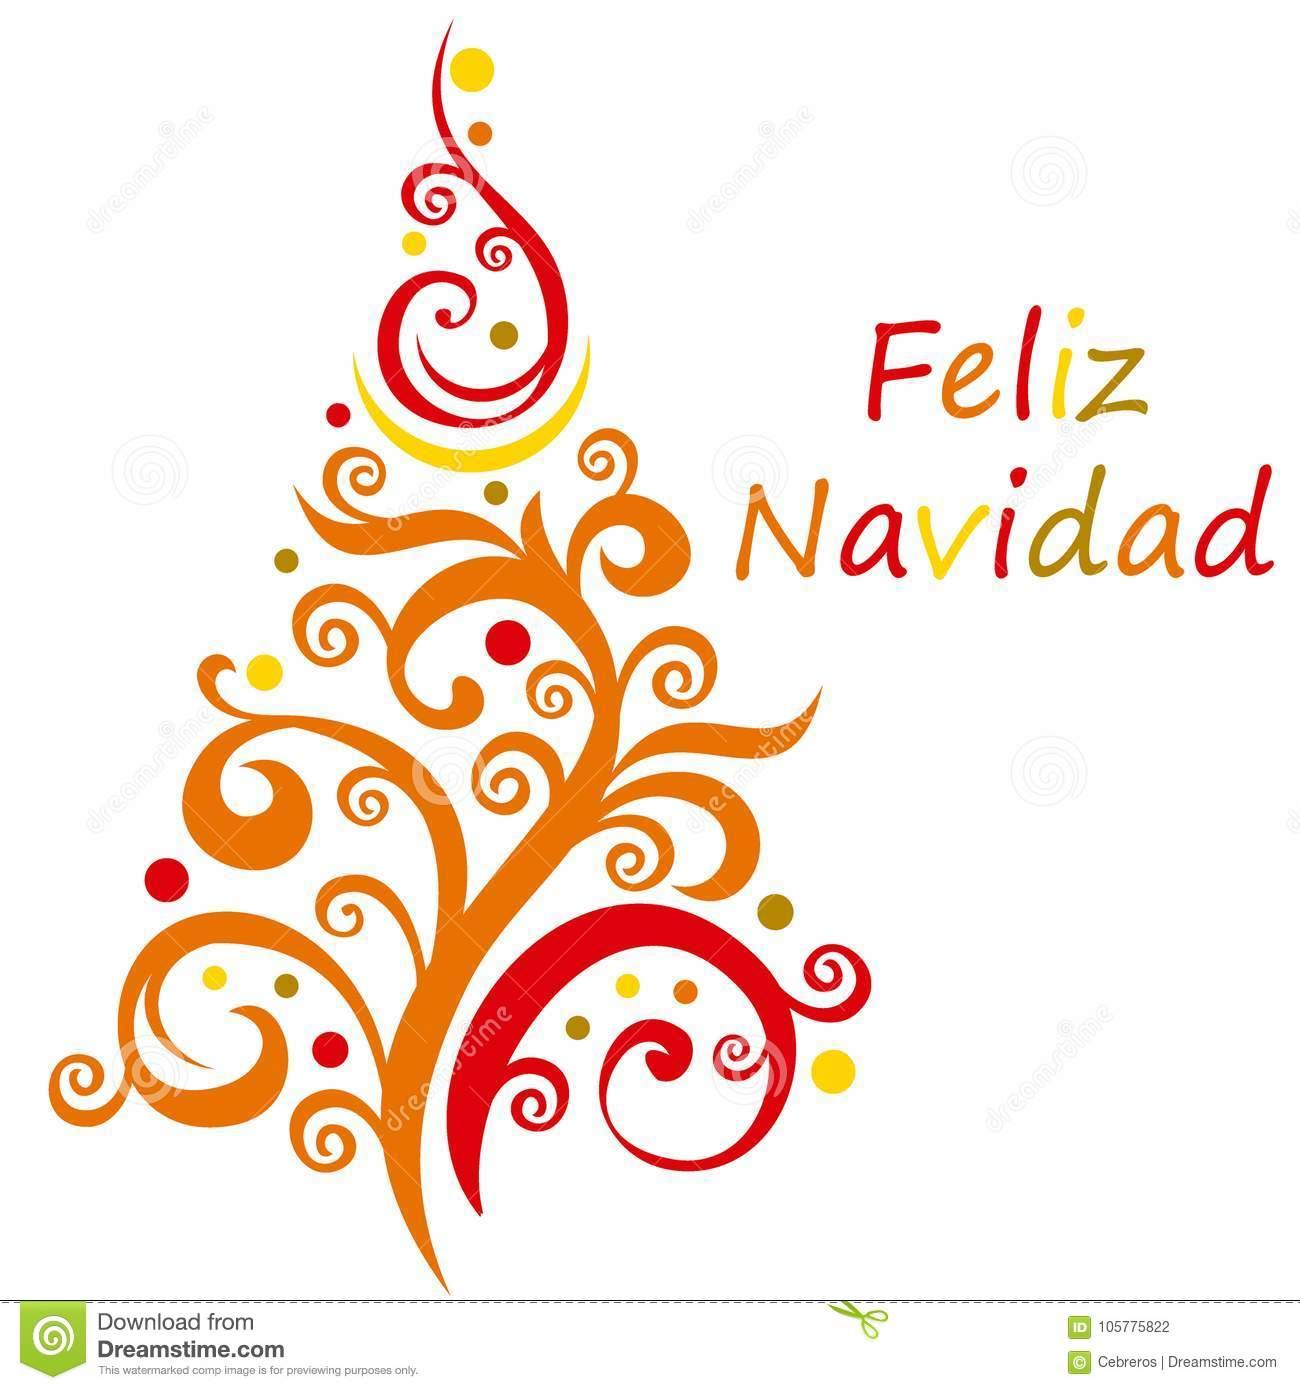 Feliz Navidad stock illustration. Illustration of background.